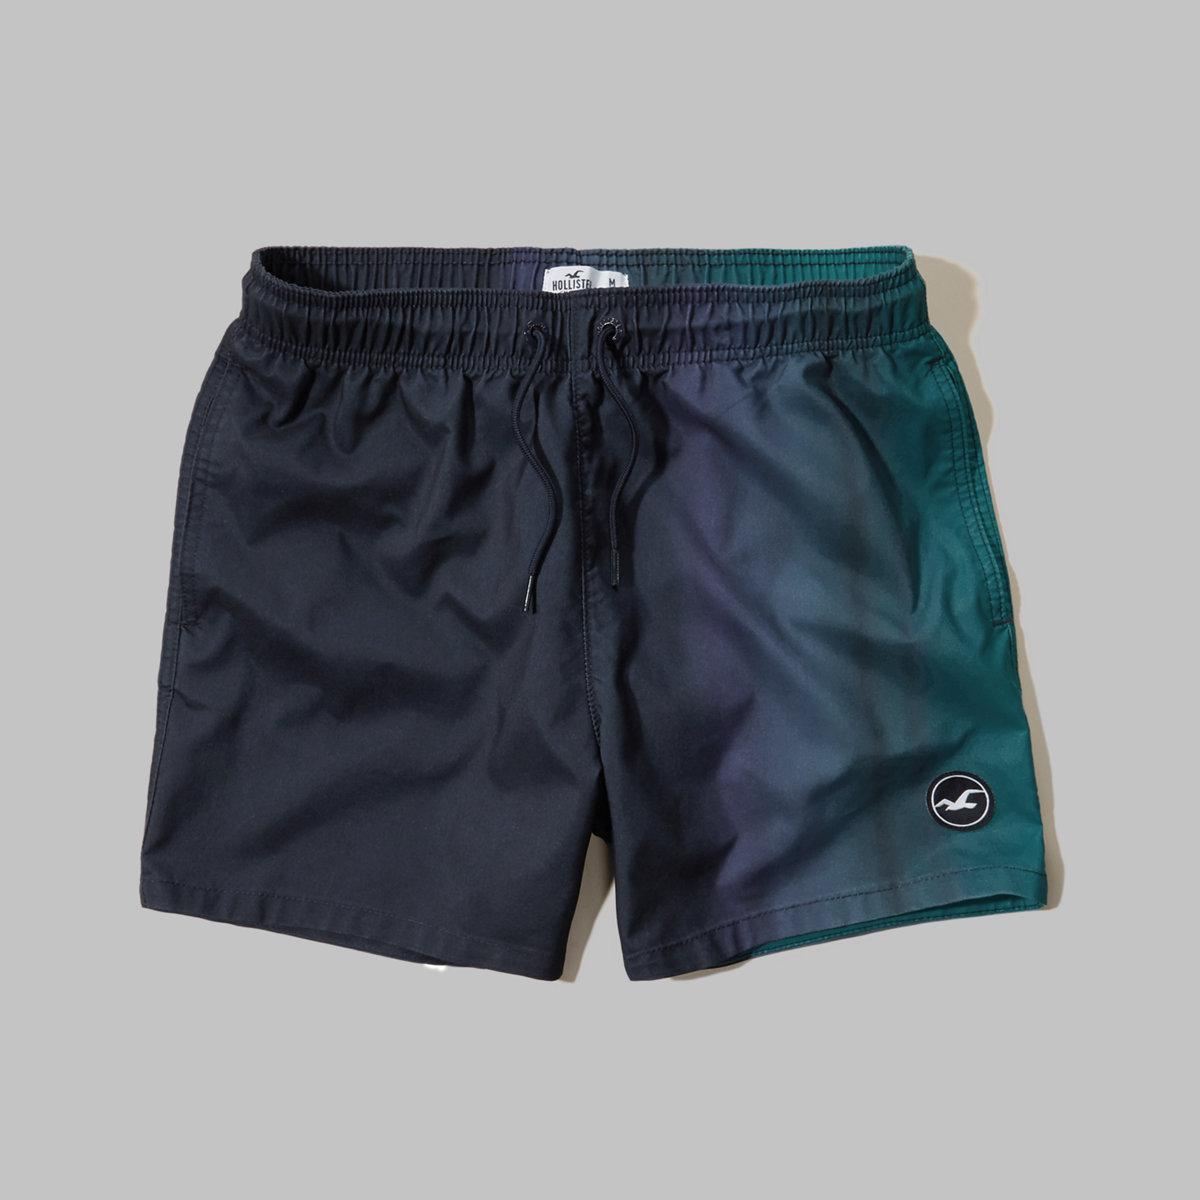 Iconic Guard Fit Swim Shorts